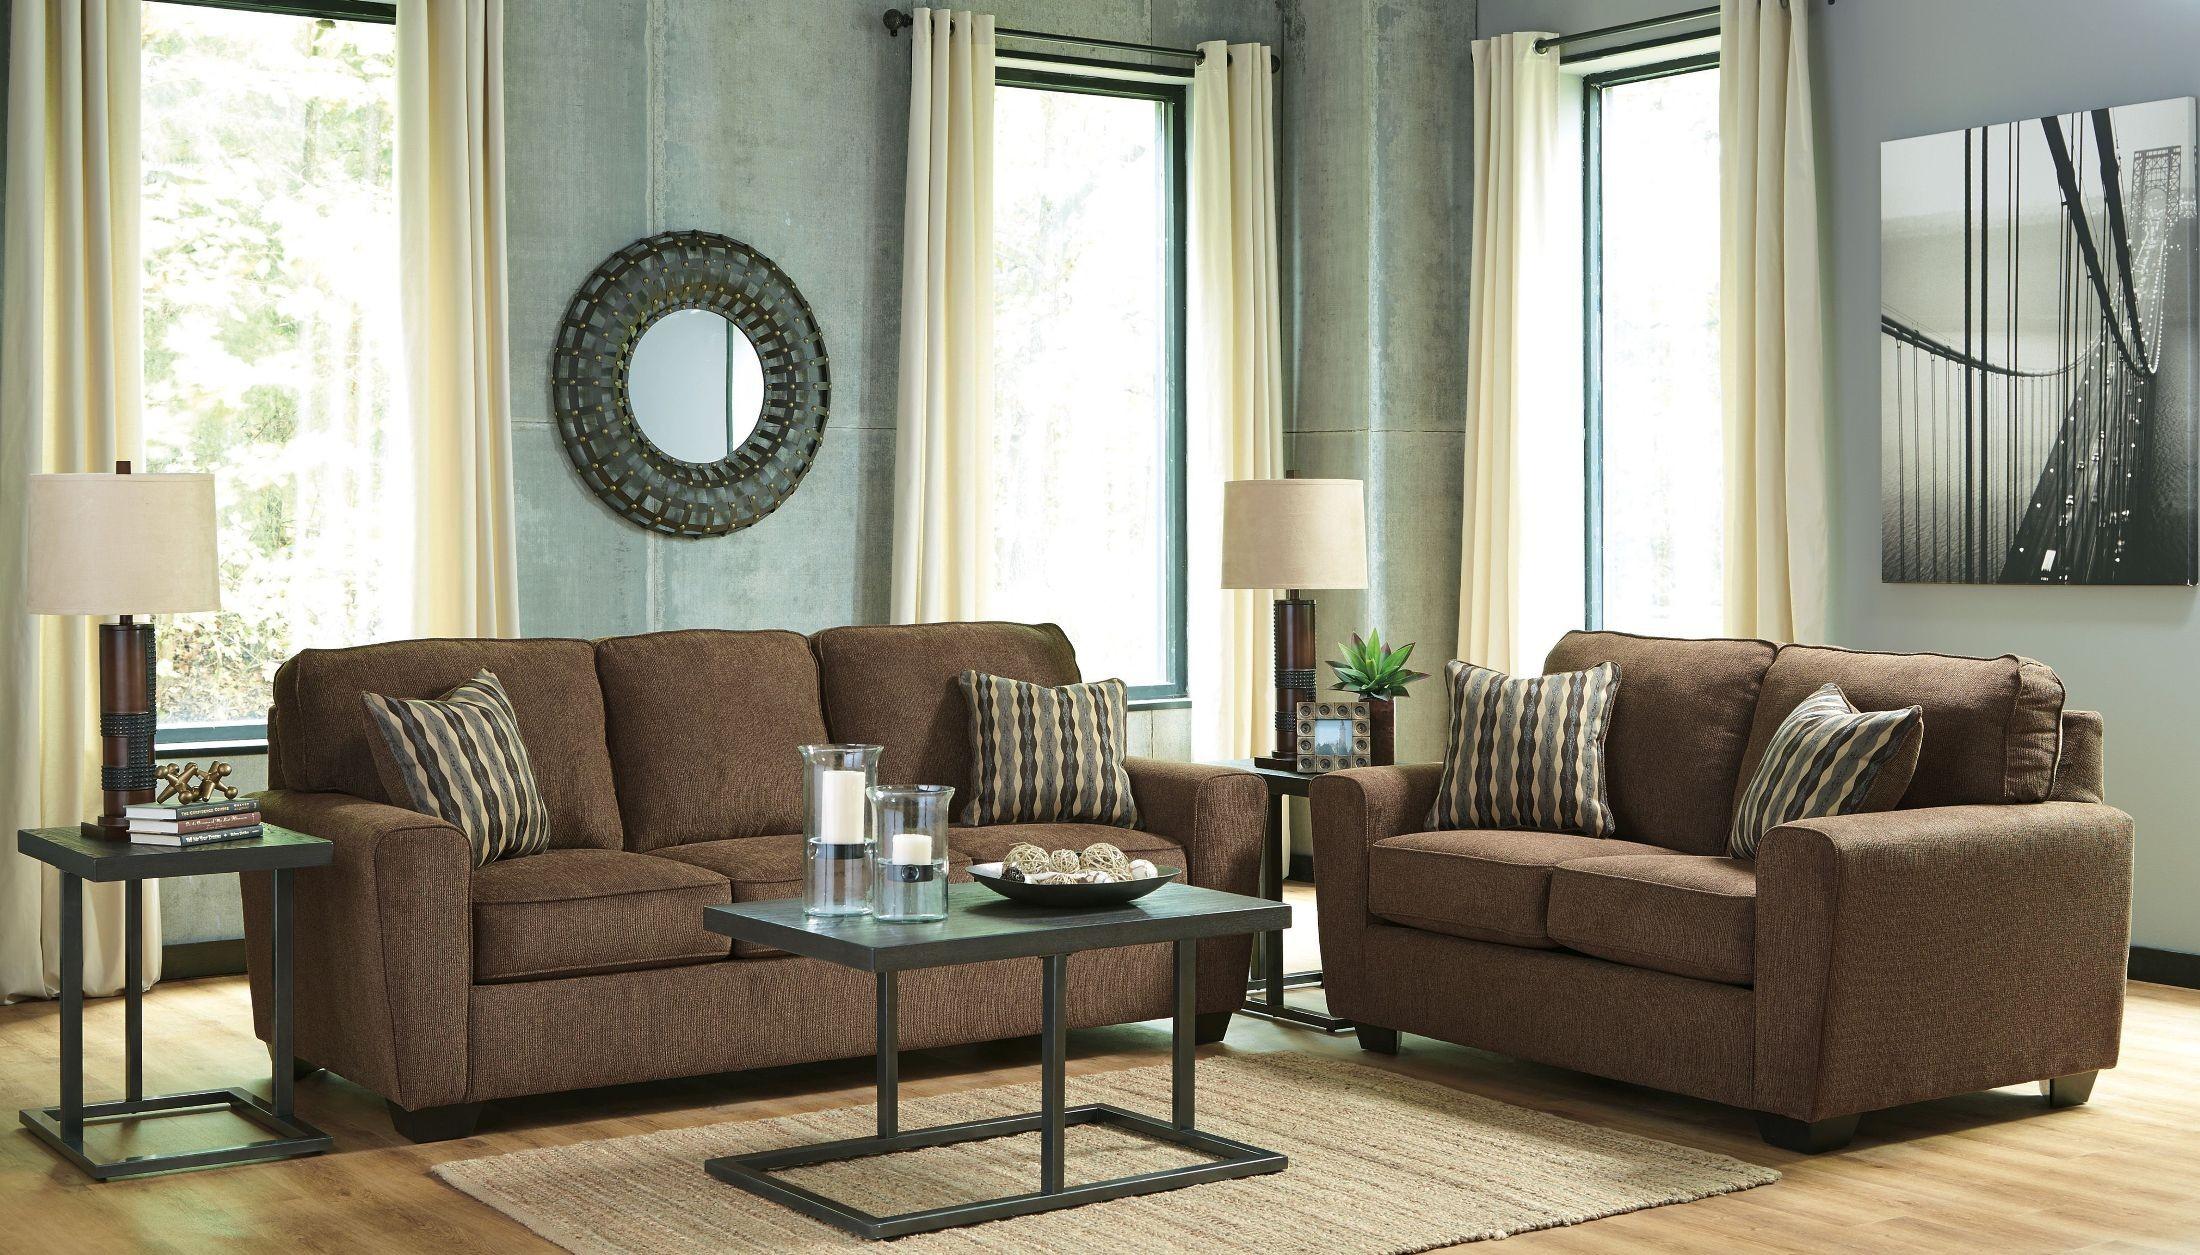 Landoff walnut living room set 2460438 ashley for Walnut furniture living room